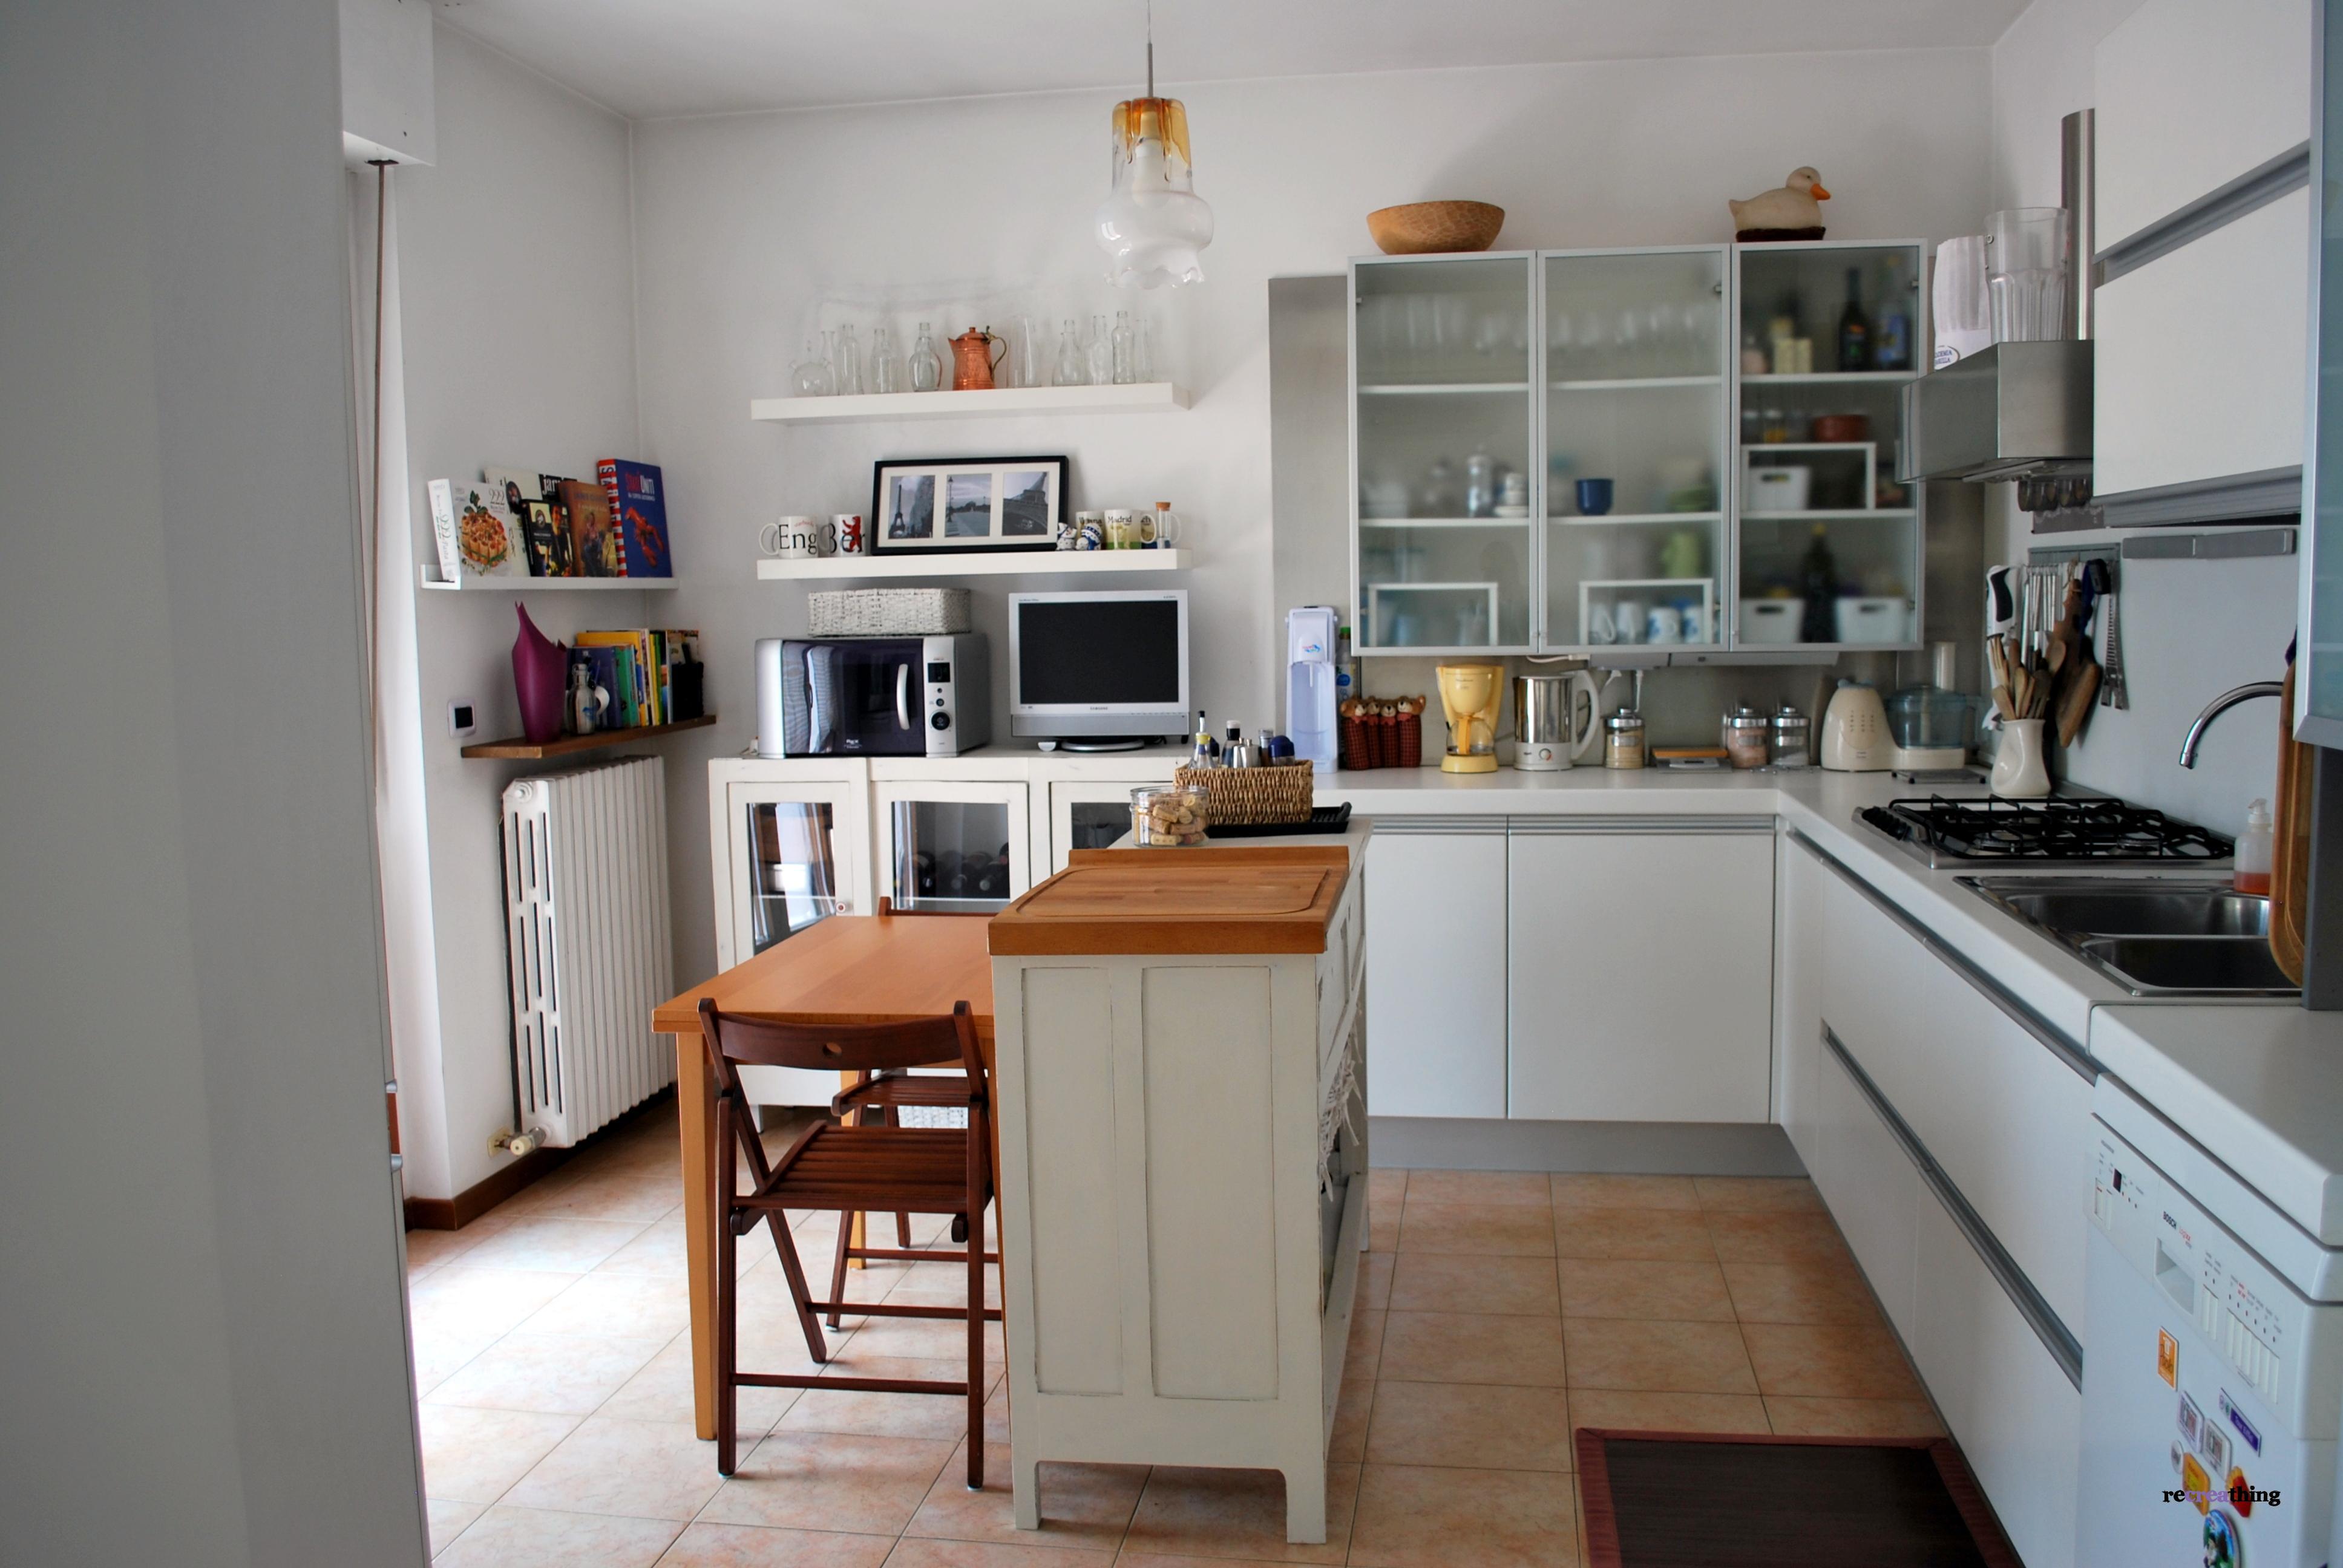 Alzatina creativo ikea - Ikea penisola cucina ...